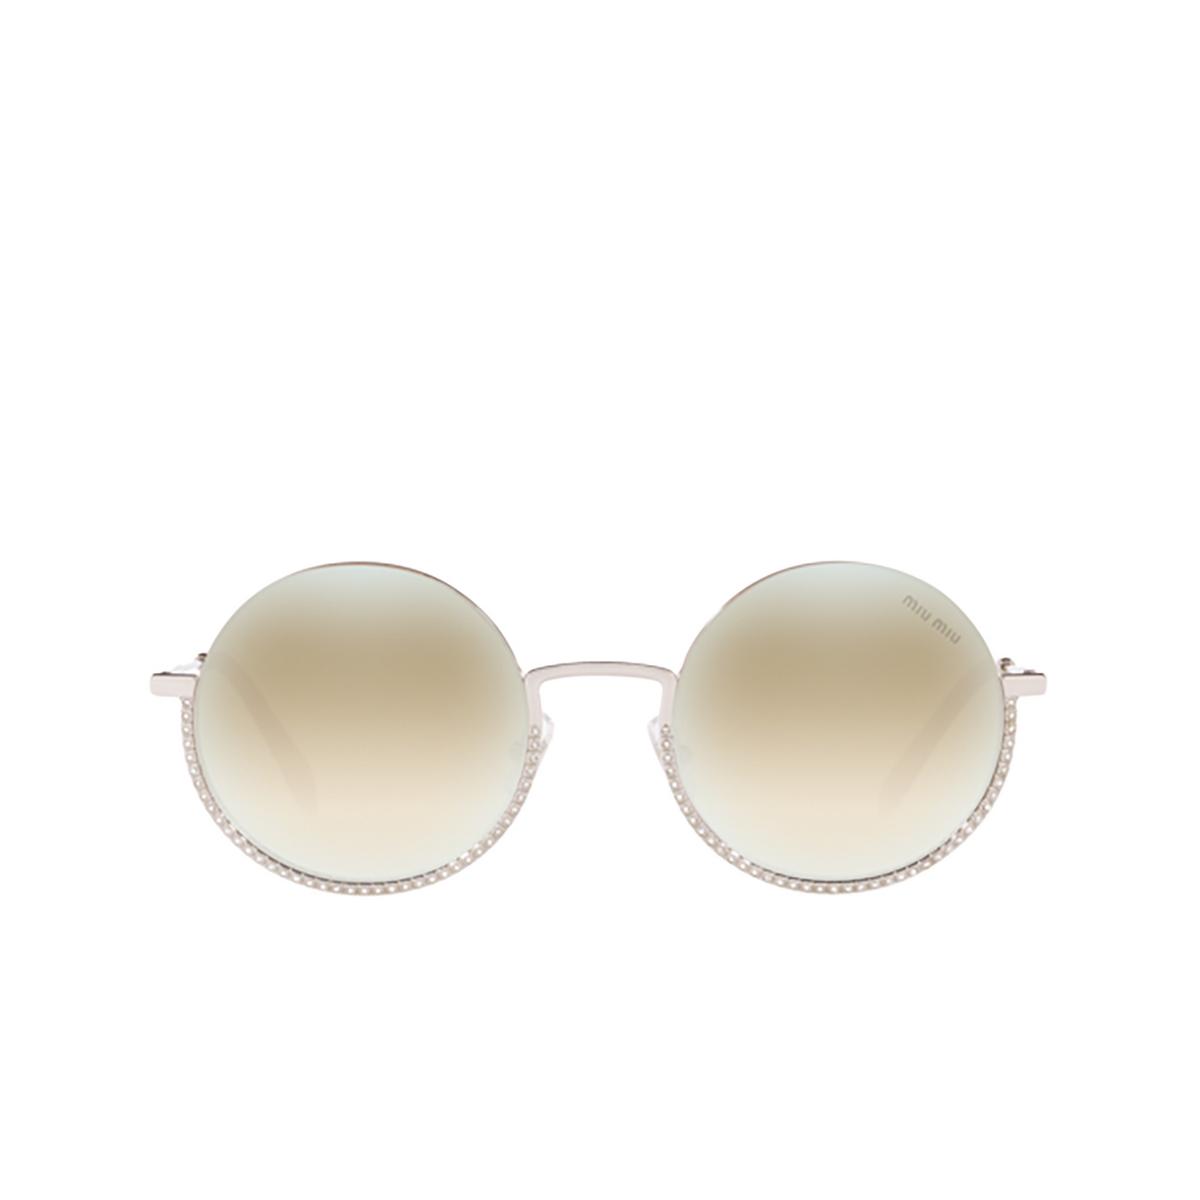 Miu Miu® Round Sunglasses: MU 69US color Silver 1BC168.